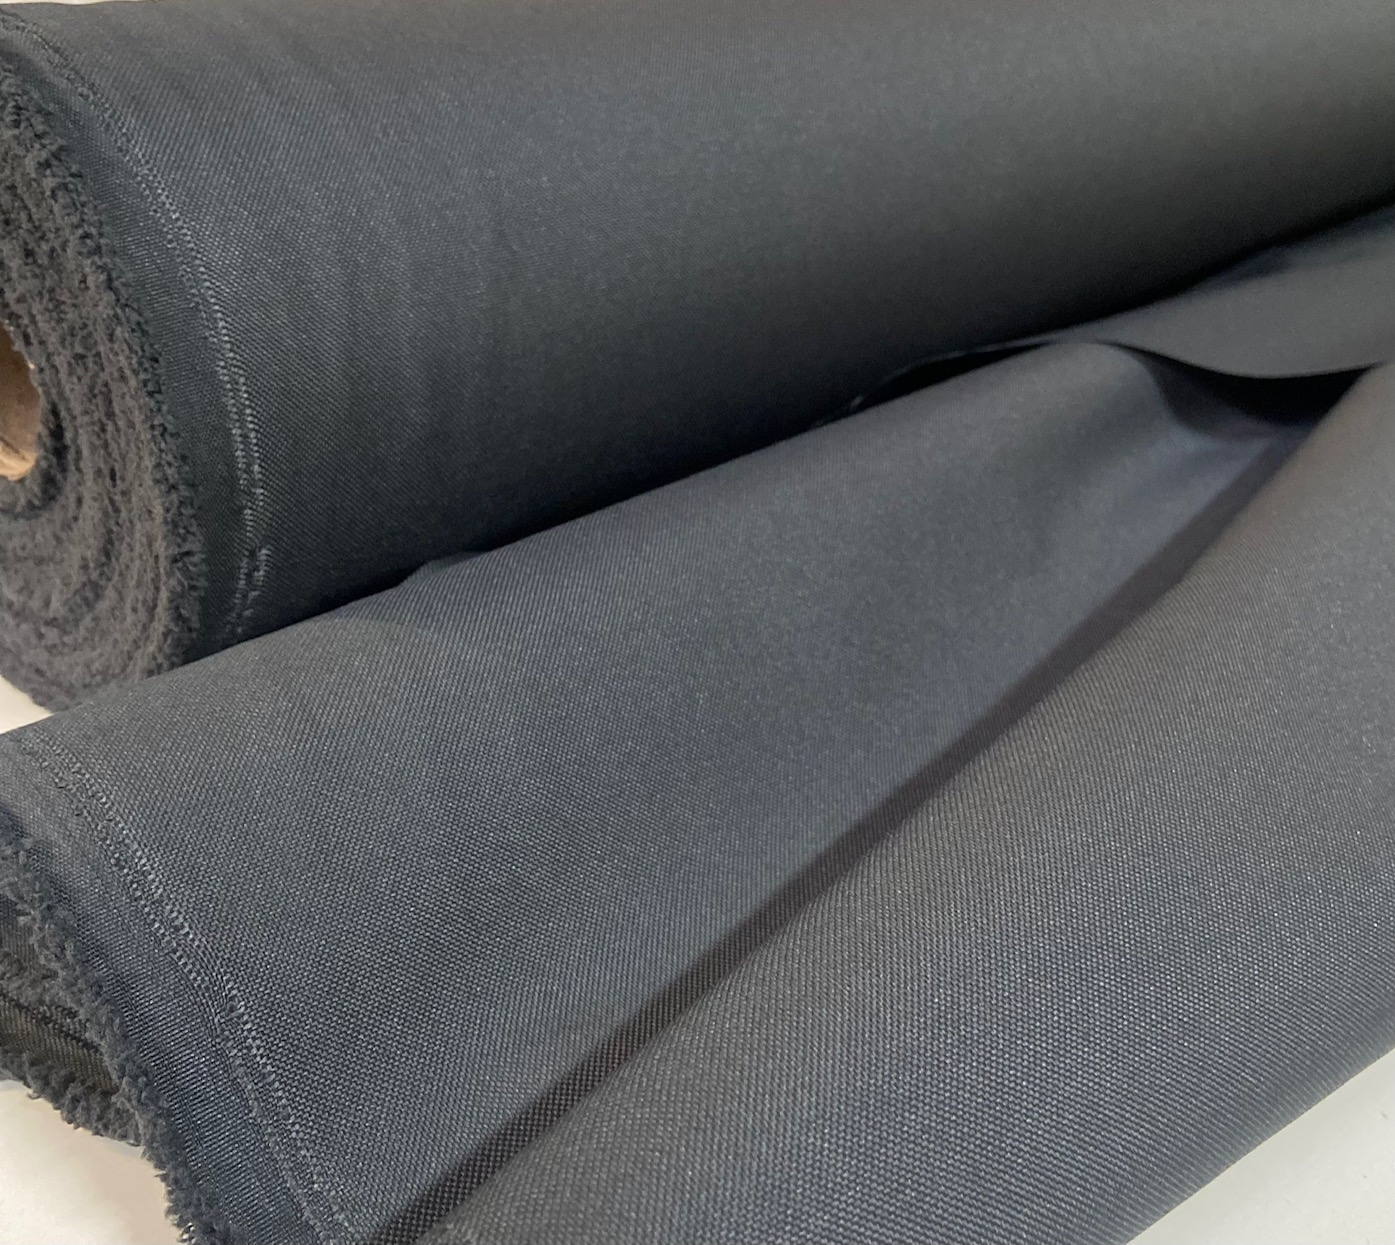 Oxford Fabric, weight 200g/m², width 160cm, dark grey. Polyester PU. Free shipping!